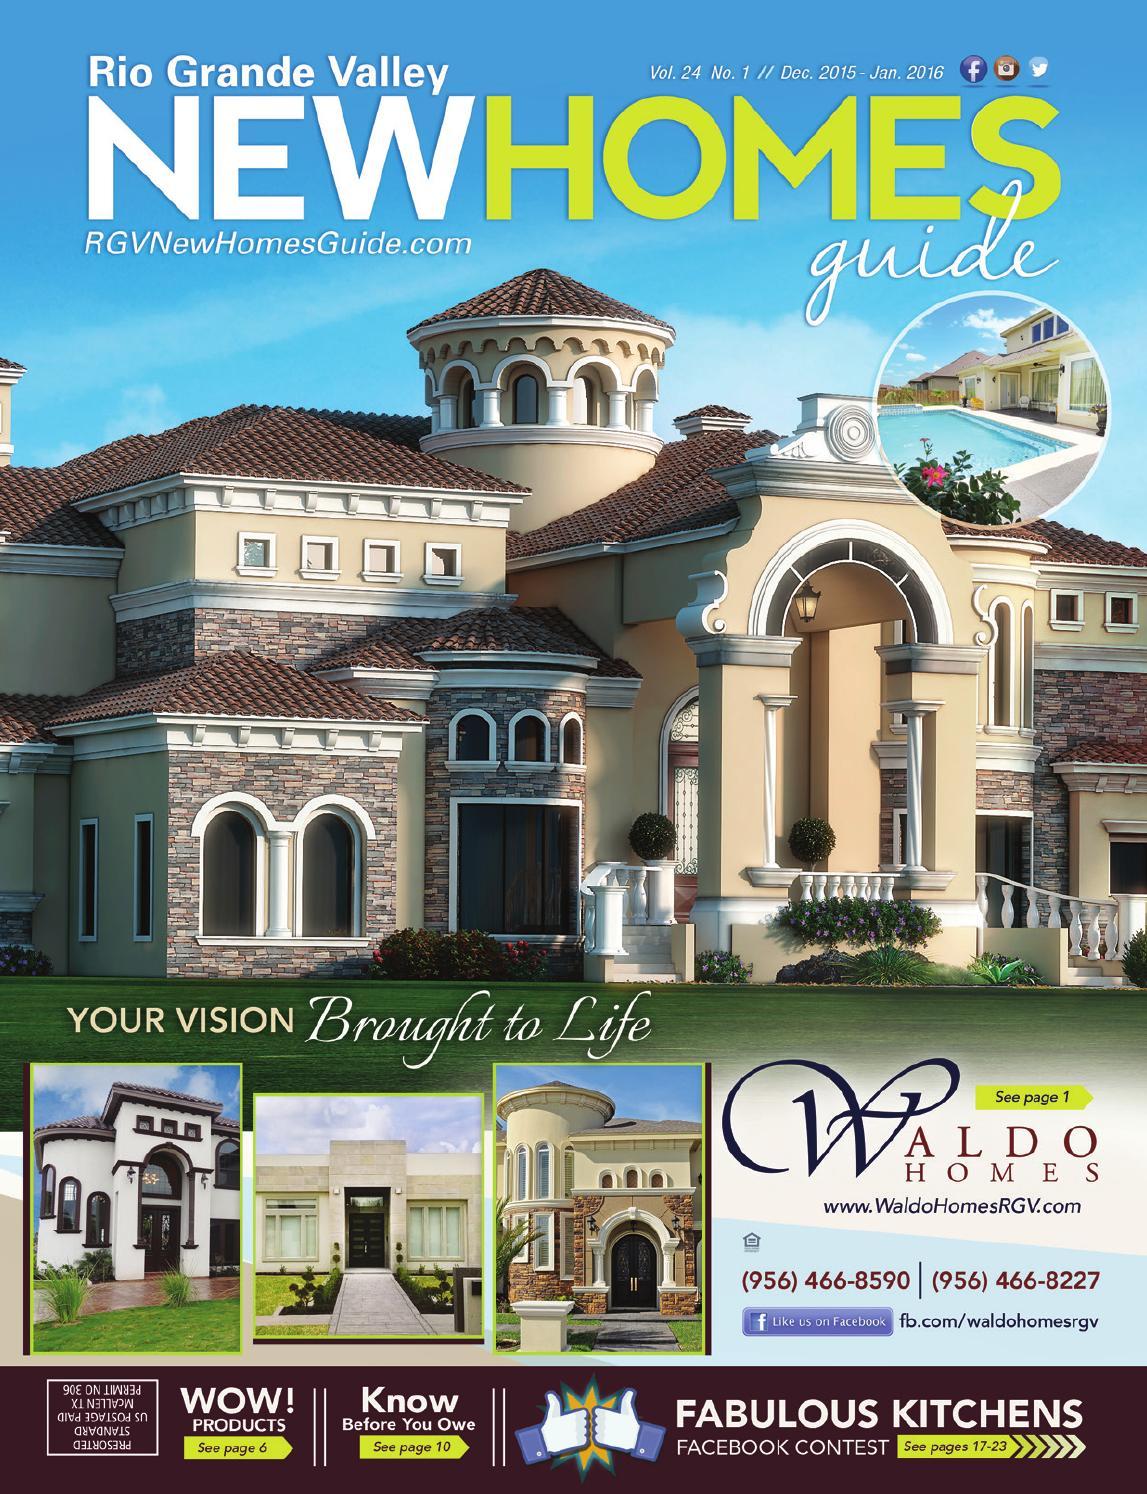 Rgv new homes guide vol 24 1 dec 39 15 jan 39 16 by rgv for Home builders guide